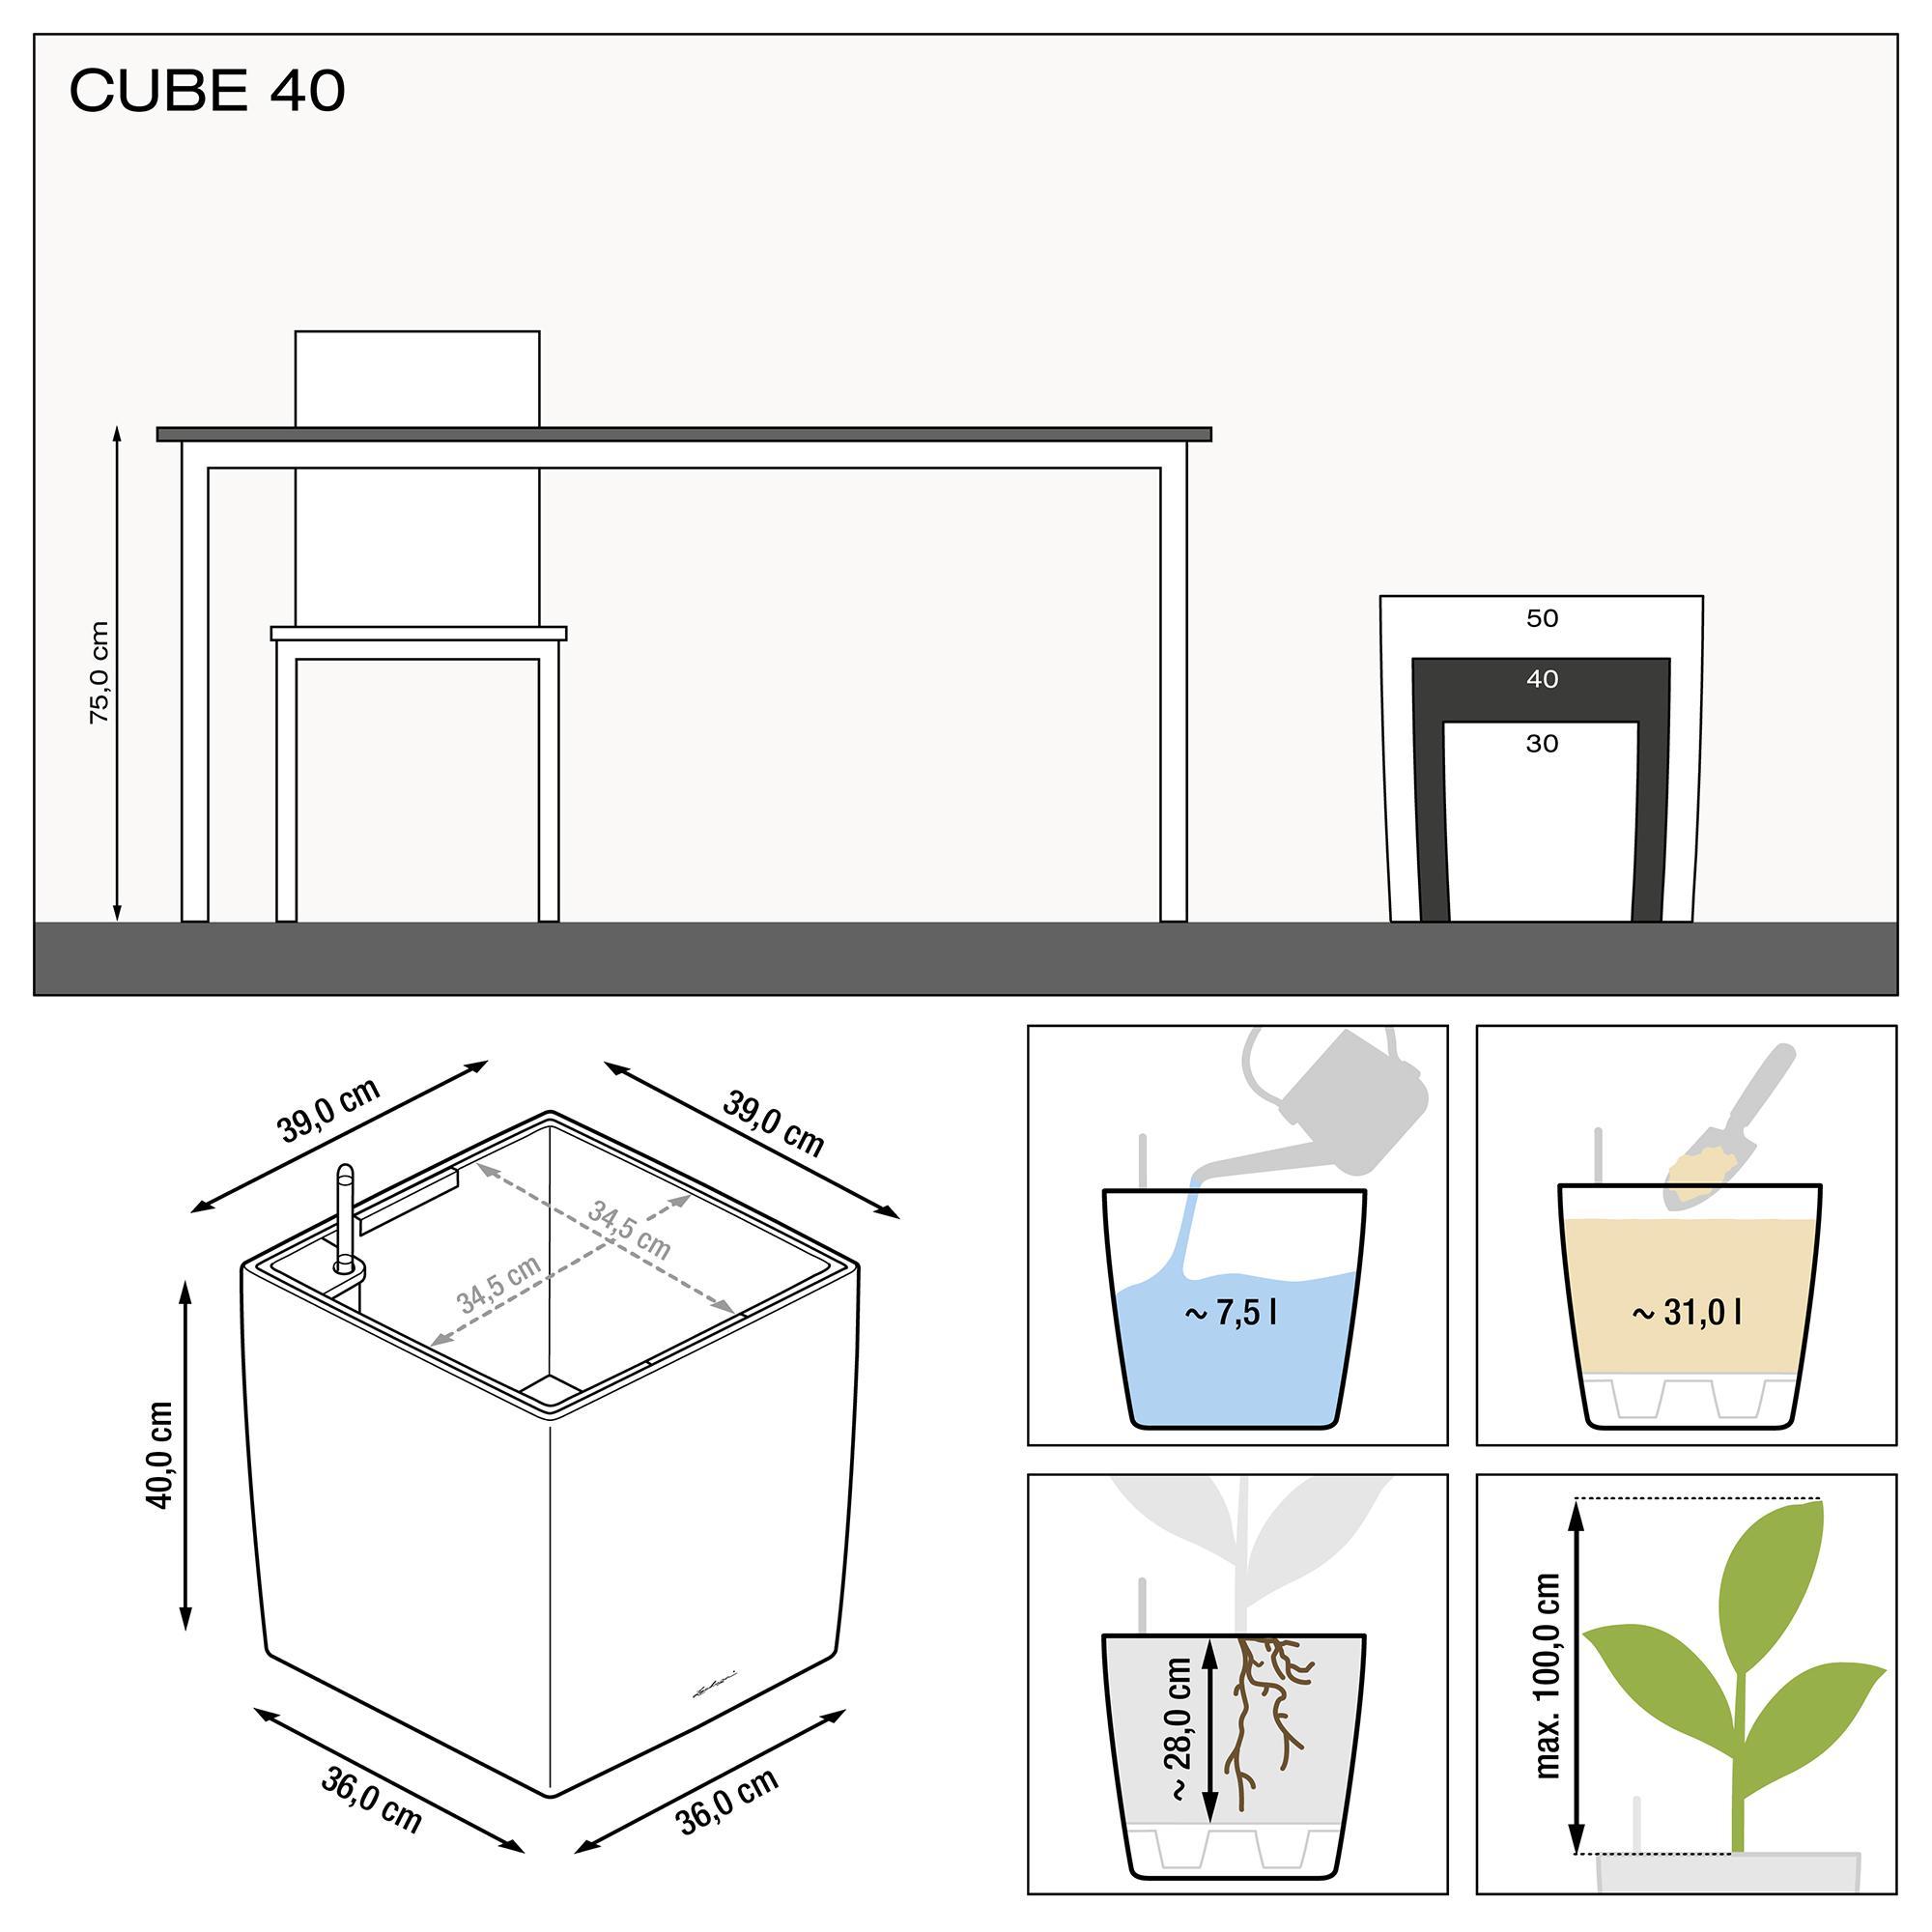 le_cube40_product_addi_nz